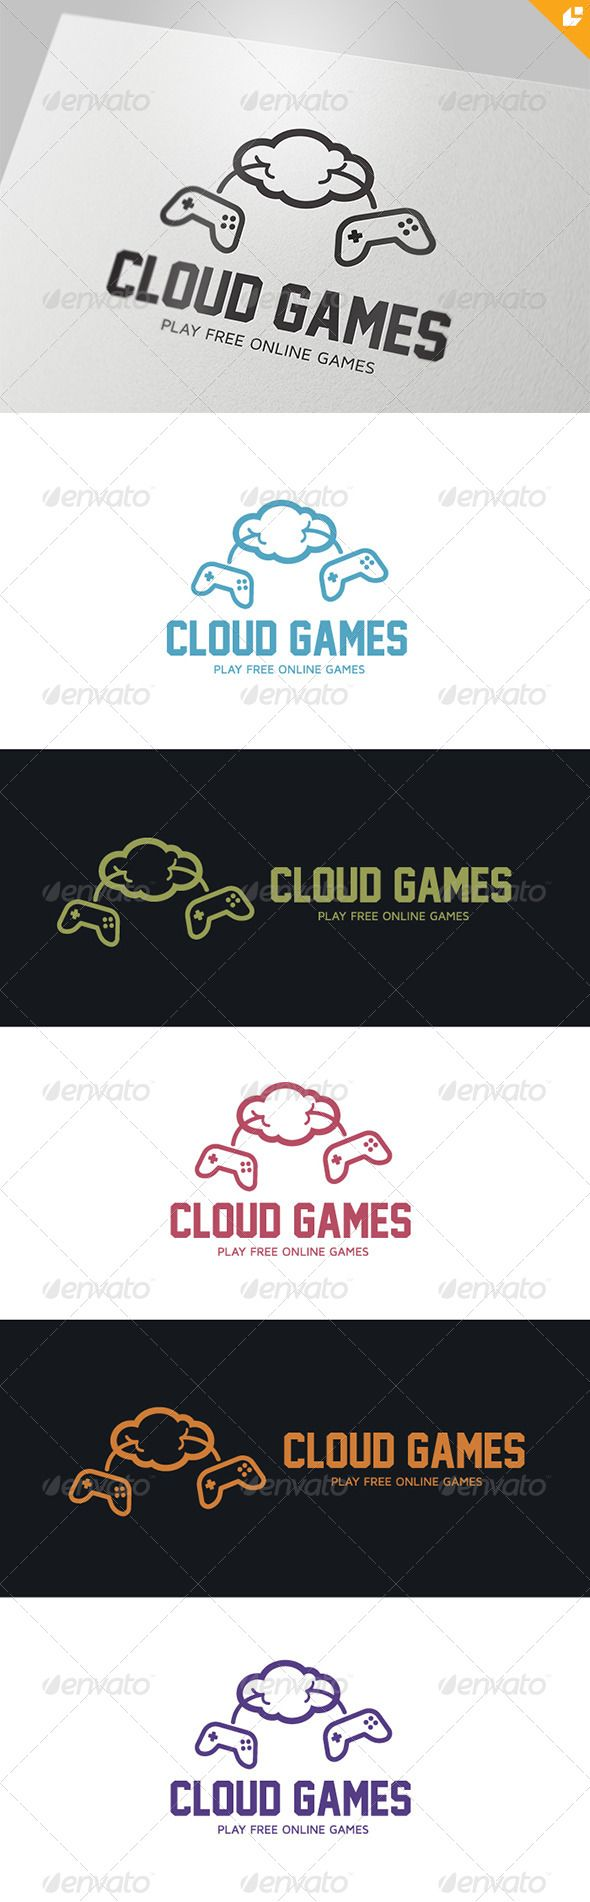 Cloud Games Logo Design Template Vector #logotype Download it here: http://graphicriver.net/item/cloud-games-logo/4375640?s_rank=331?ref=nexion